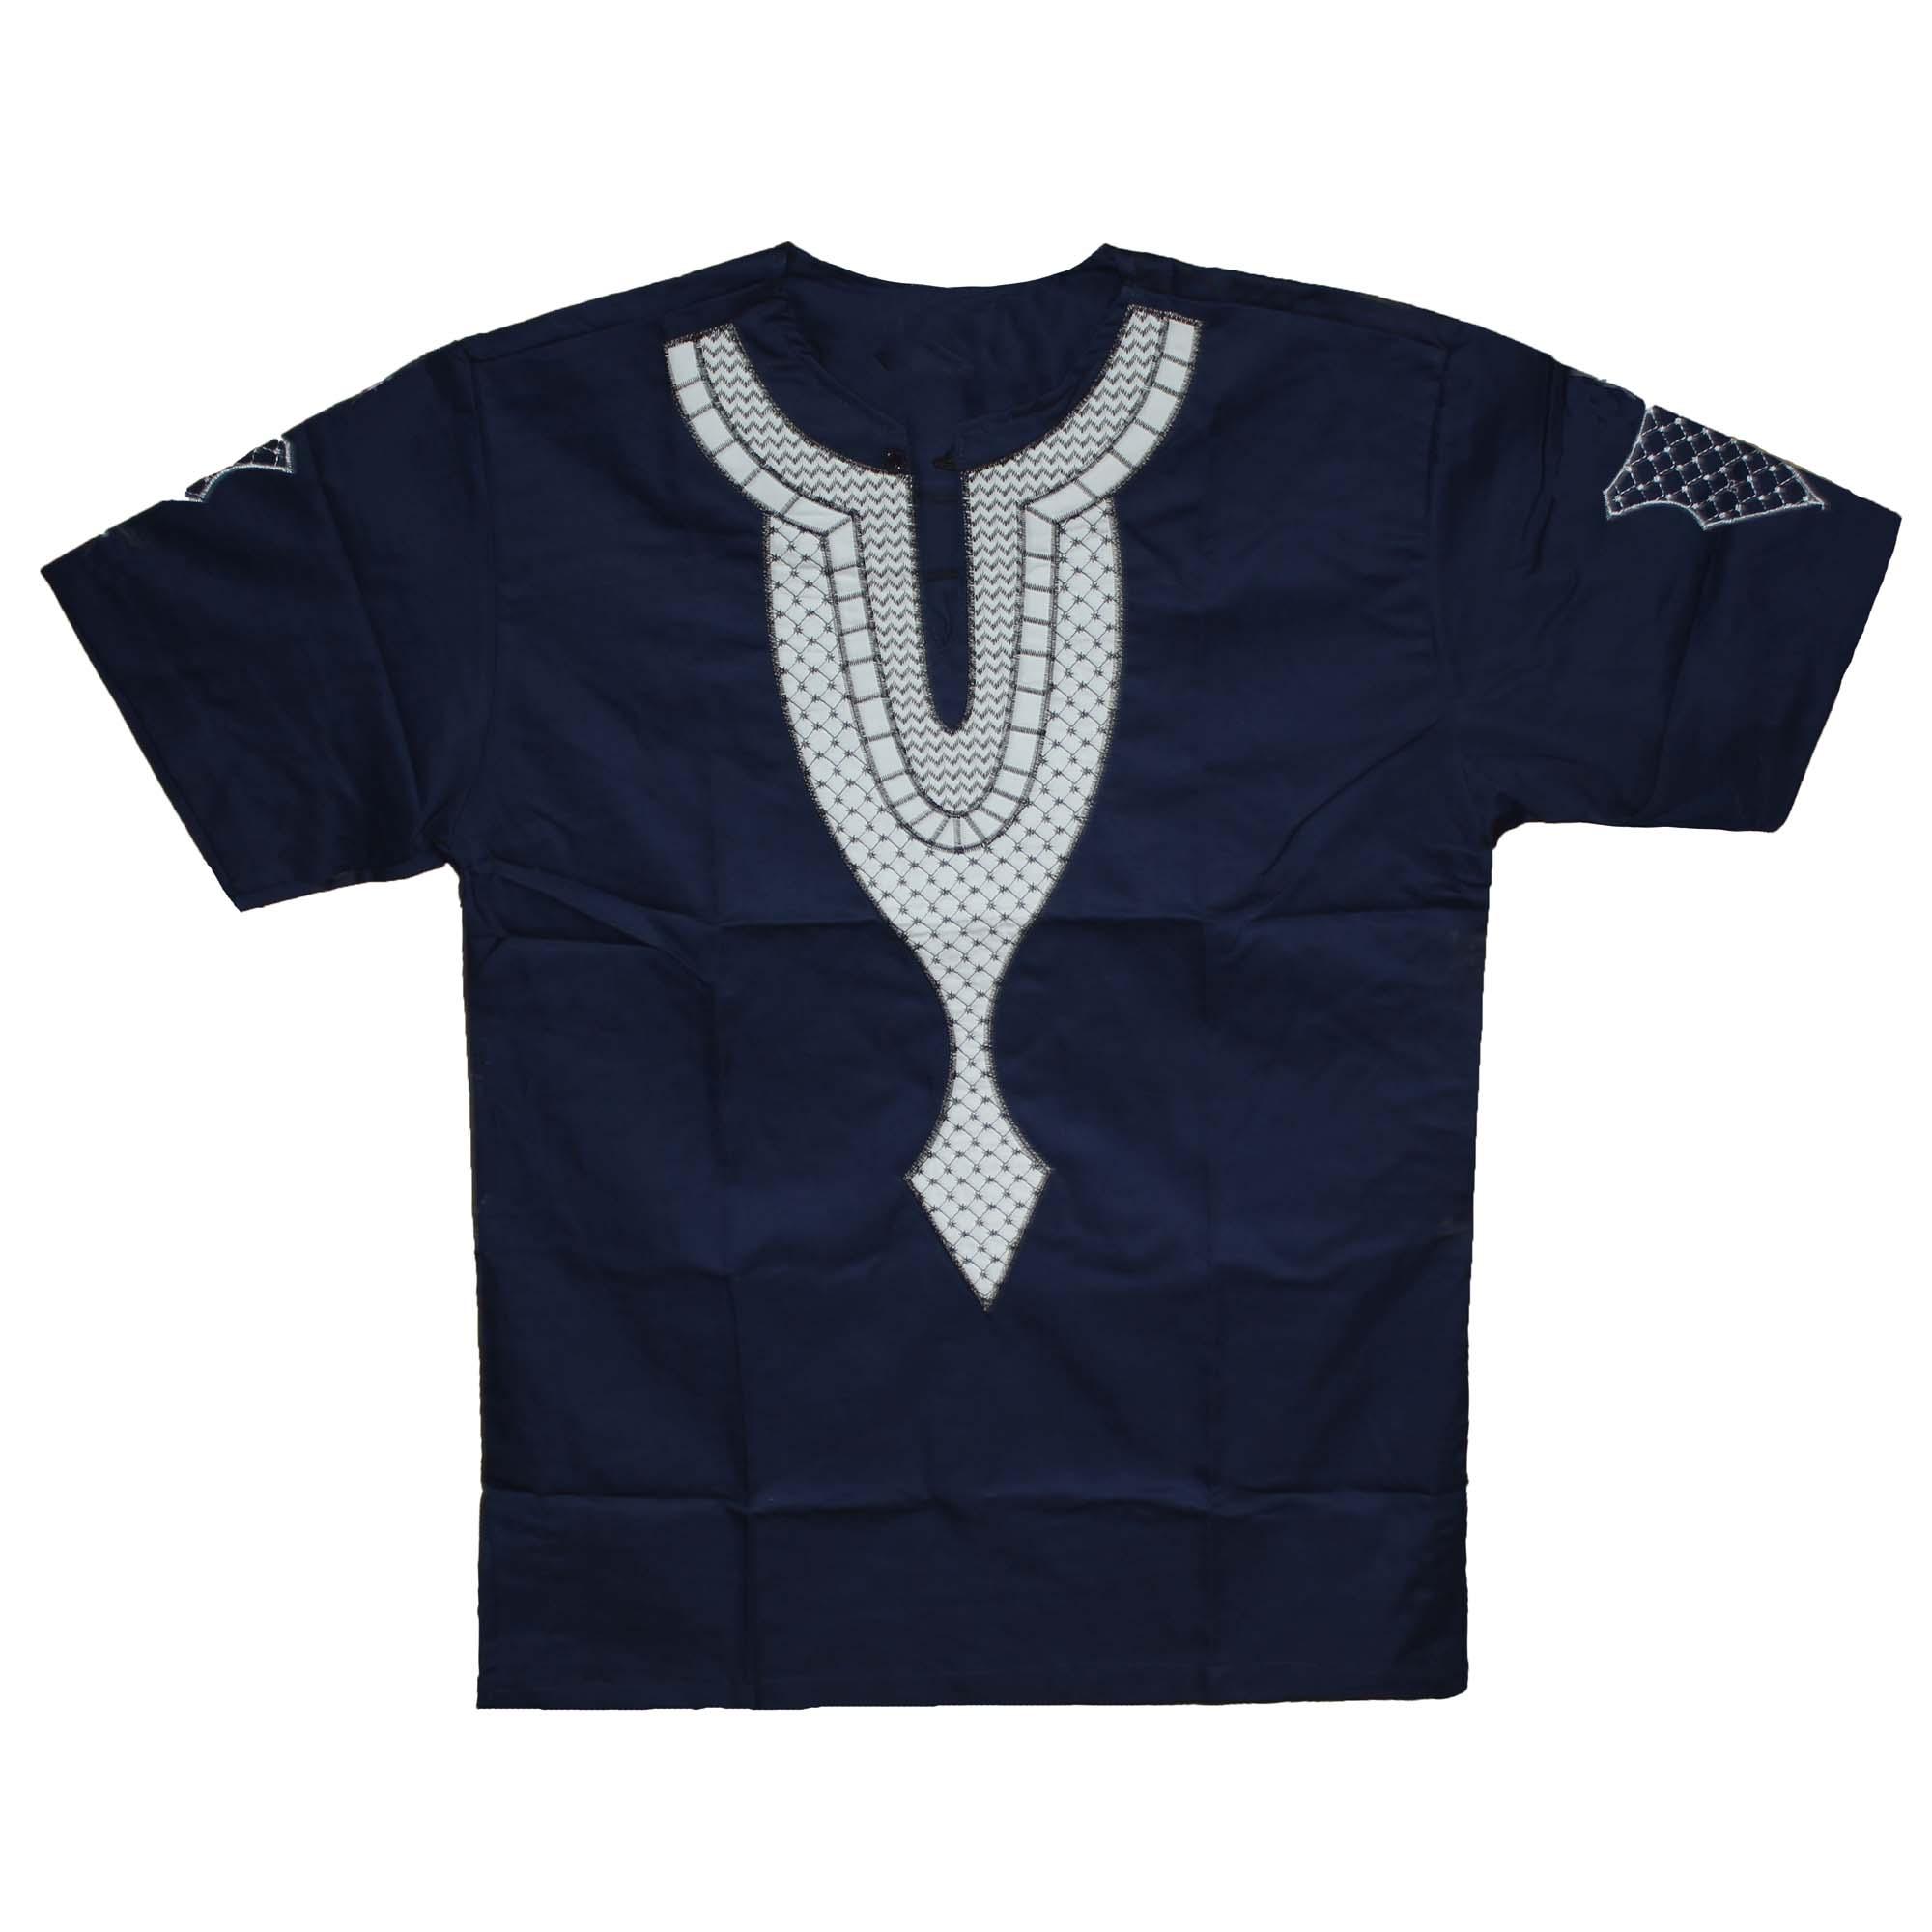 Camiseta Africa Clothes Men`s African Ethnic Embroidery Dashiki Tops Bazin Kwanzaa Dress Summer Orientar Shirts